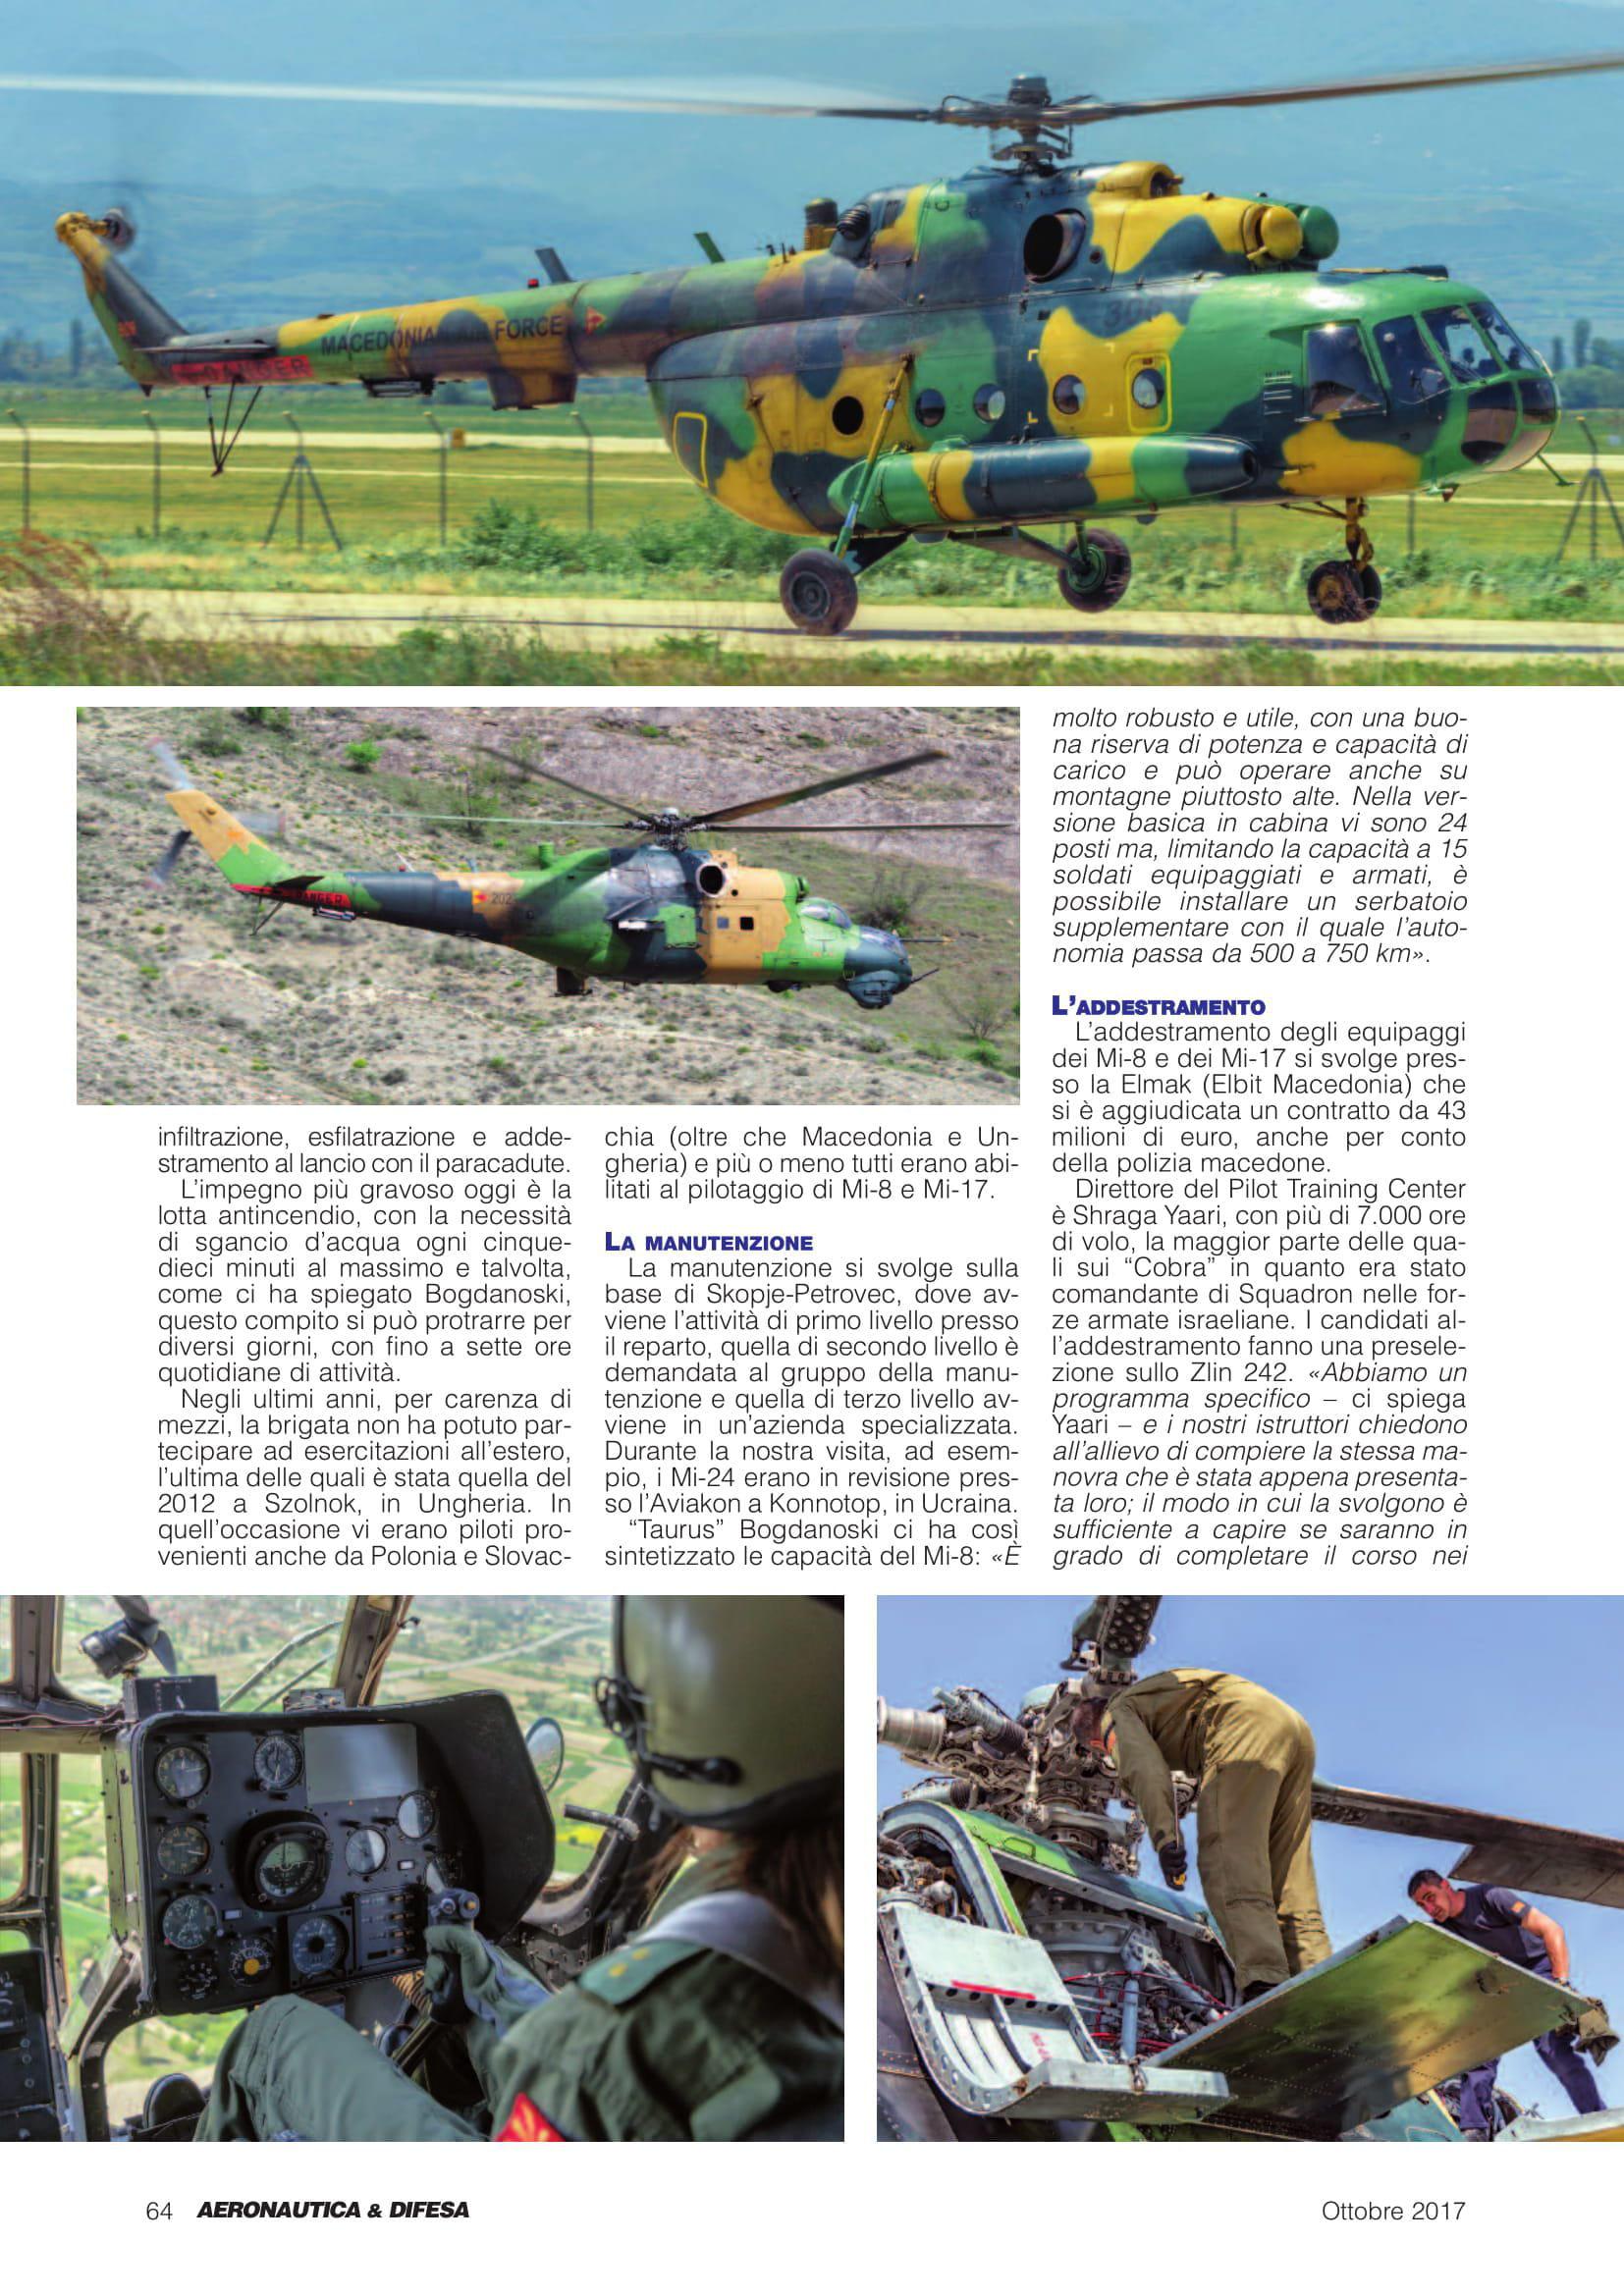 Aeronautica & Difesa (Italy)_Macedonian Air Force-4